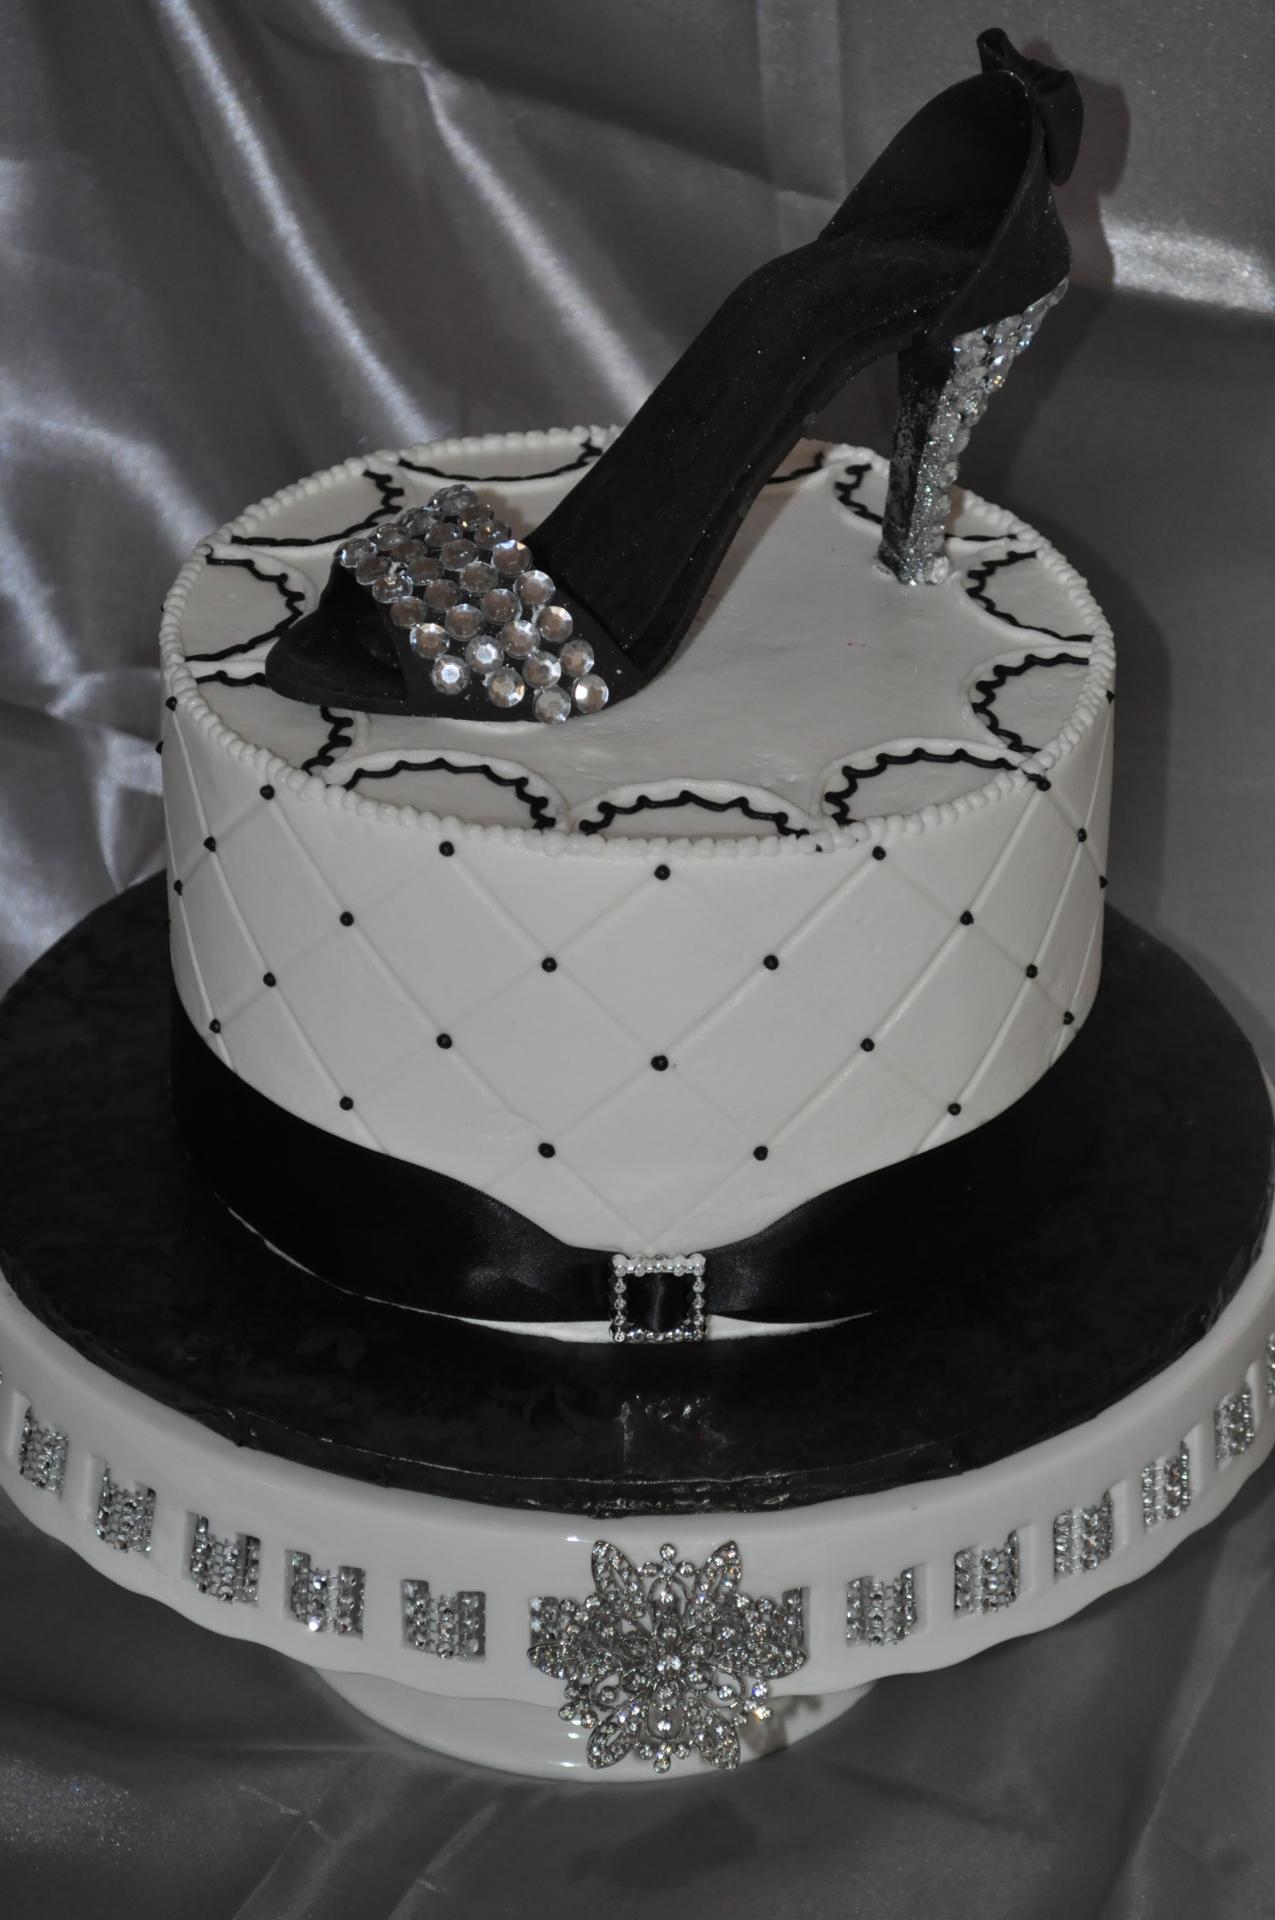 Black heel, glam cake